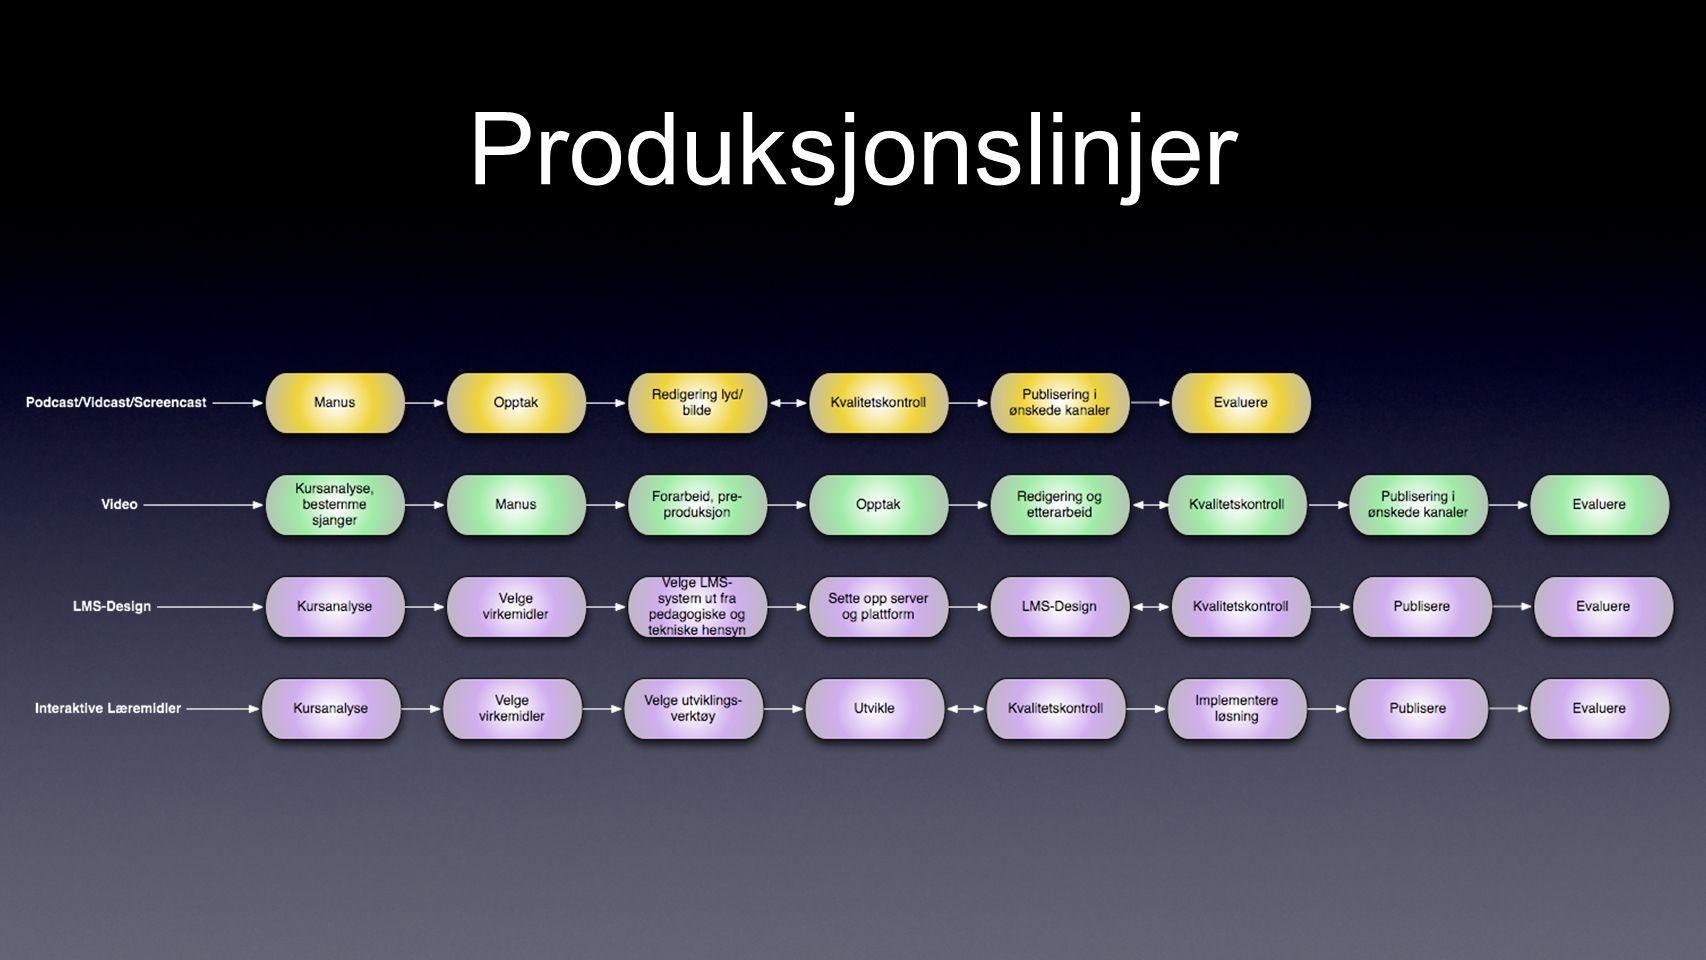 Produksjonslinjer